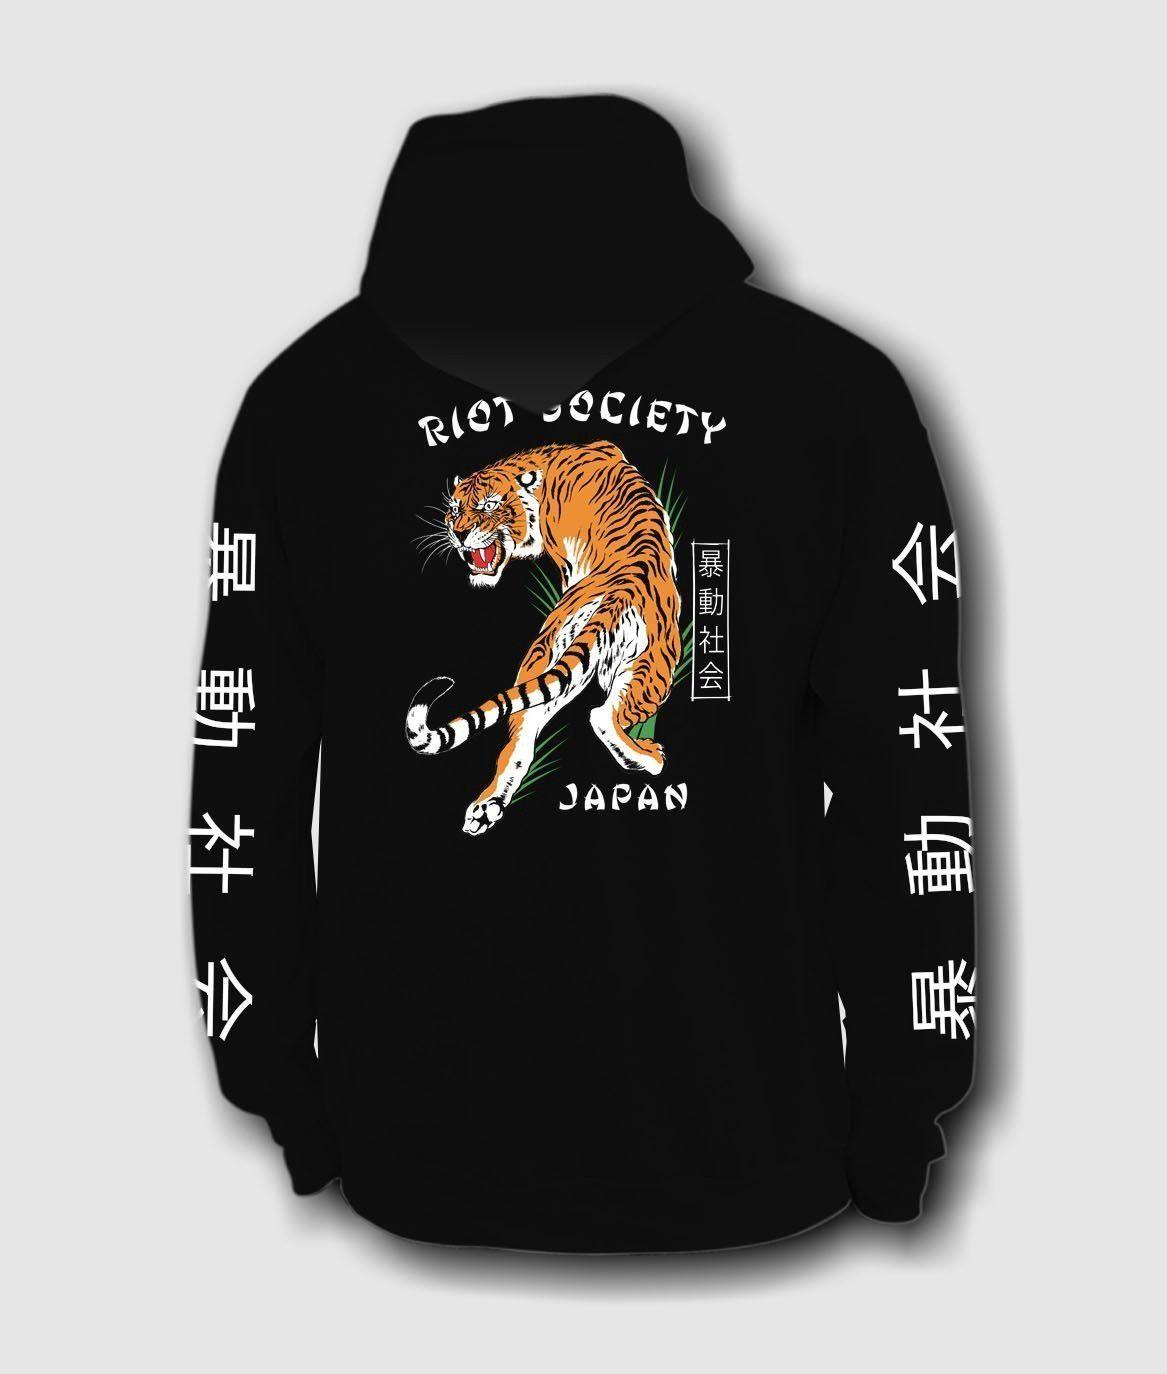 a5e812c7052 Riot Society Japanese Tiger Mens Hoodie - XL